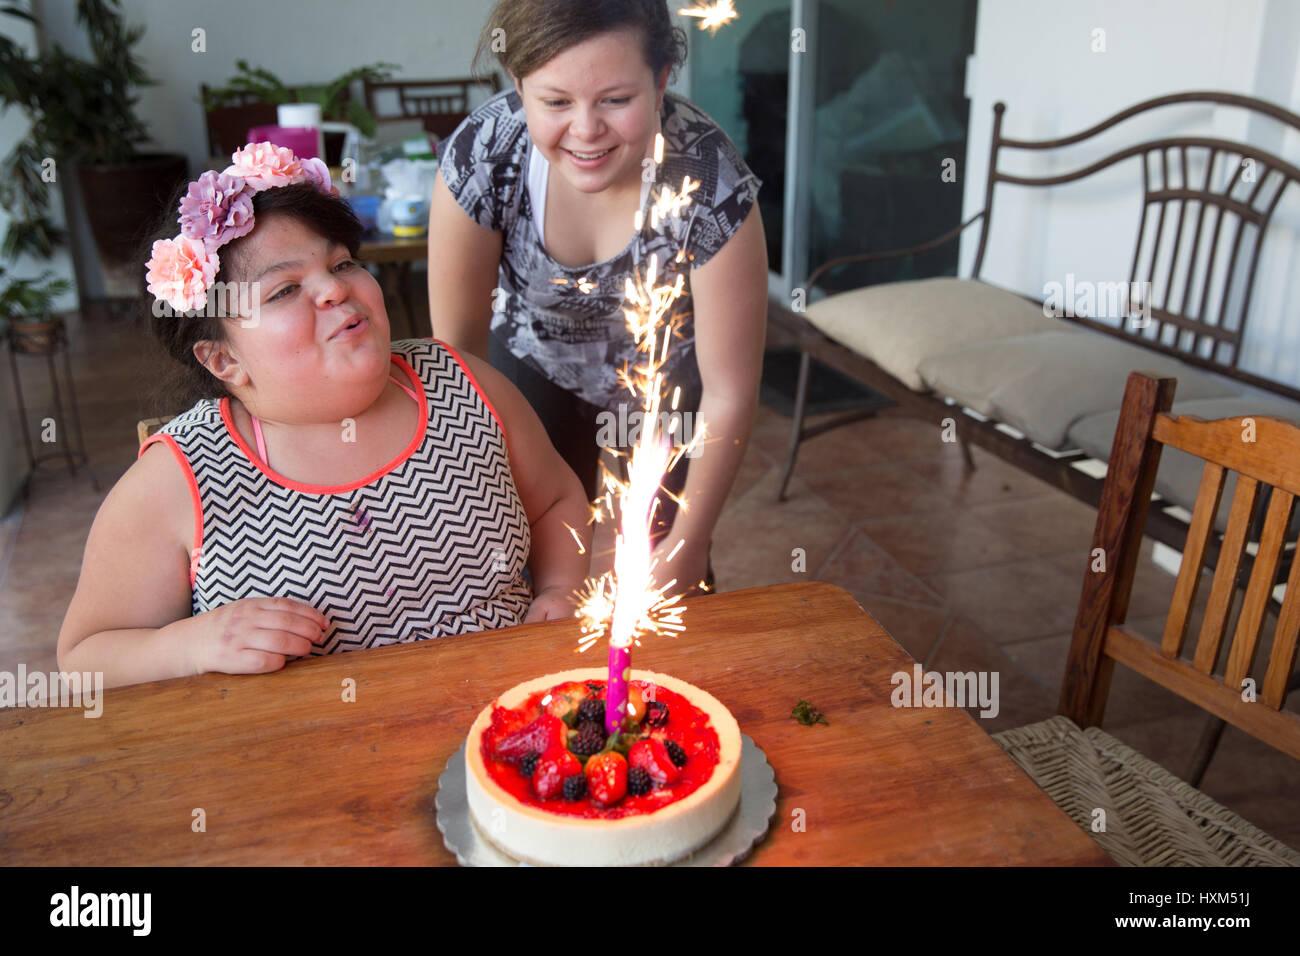 Ana Ximena Navarro (L) and her sister Ana Yamila Navarro (R), are pictured at their home in Guadalajara, Mexico - Stock Image